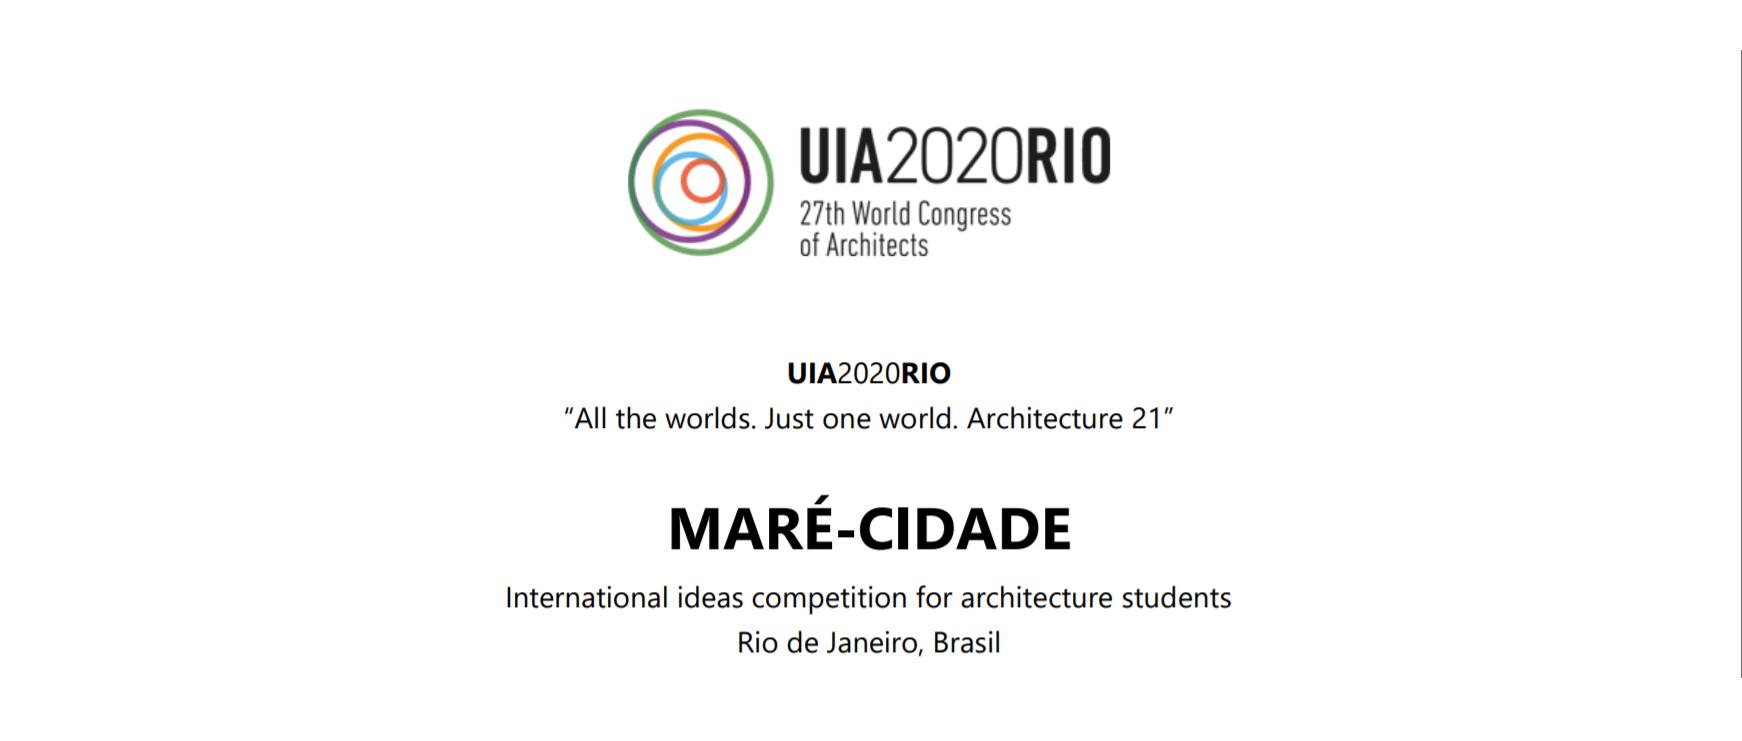 UIA 2020 RIO 玛丽市国际建筑学生创意竞赛